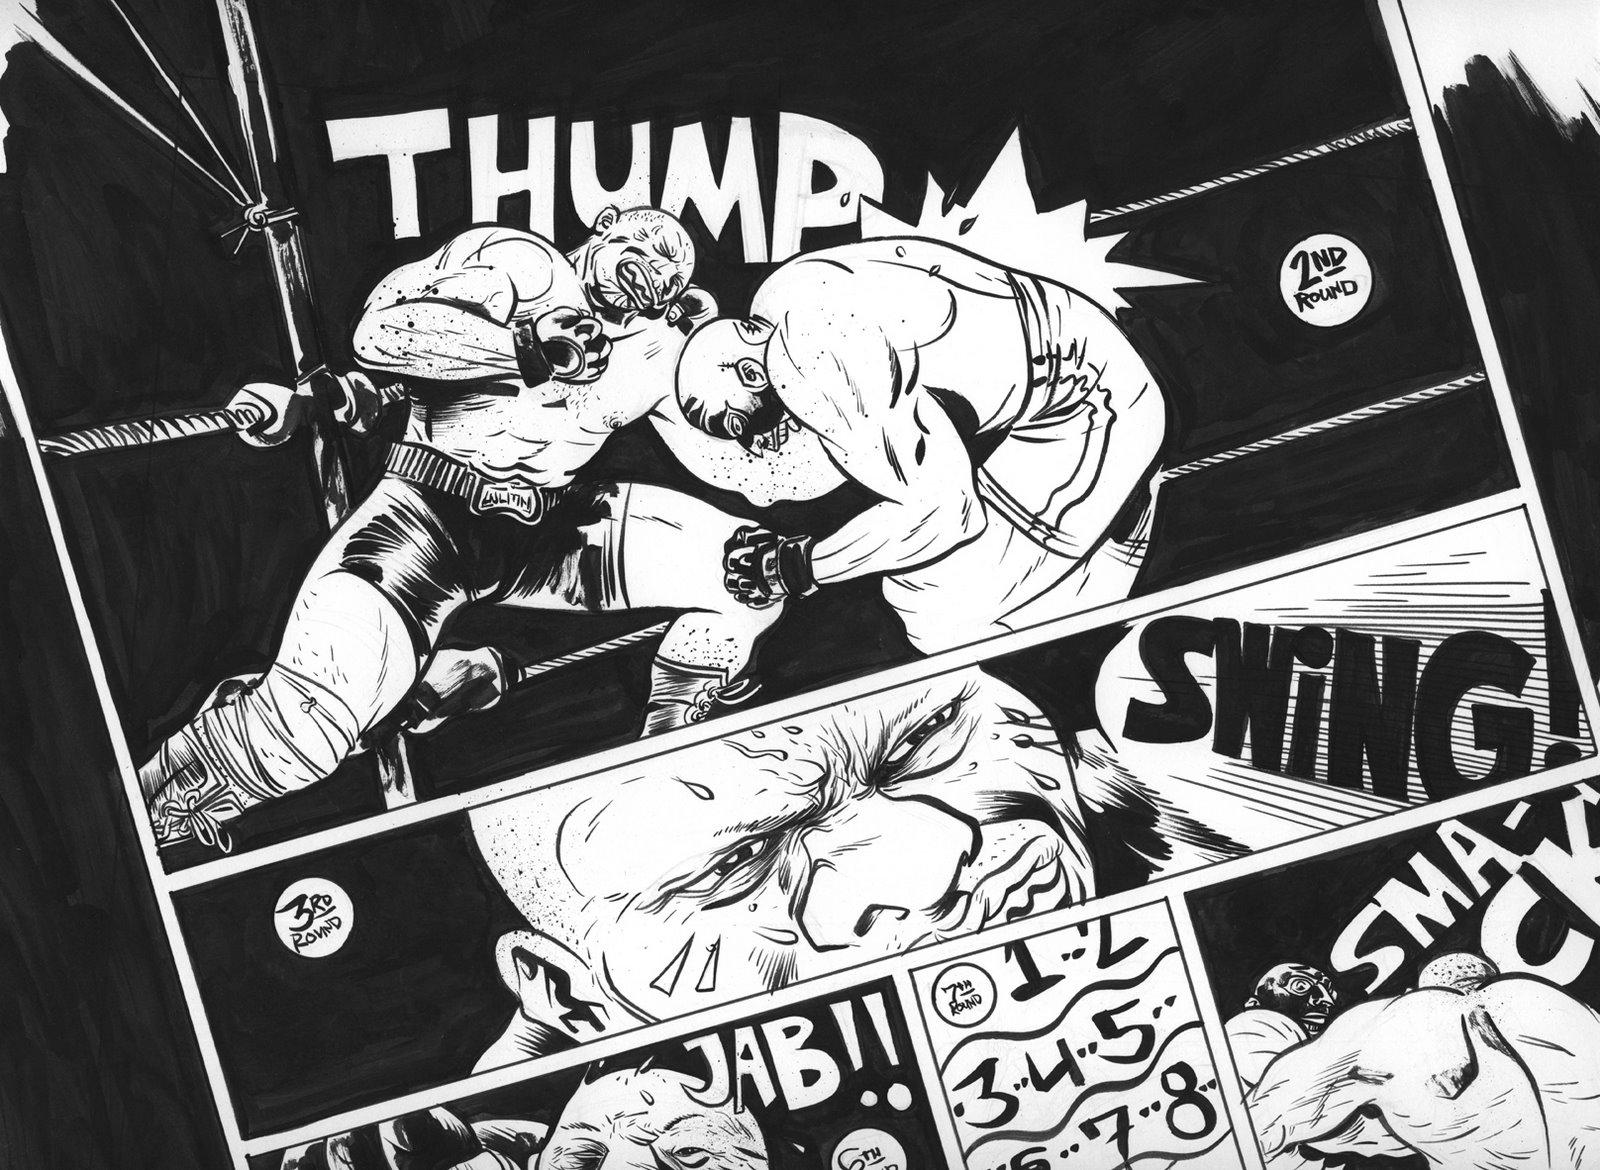 [boxing.jpg]